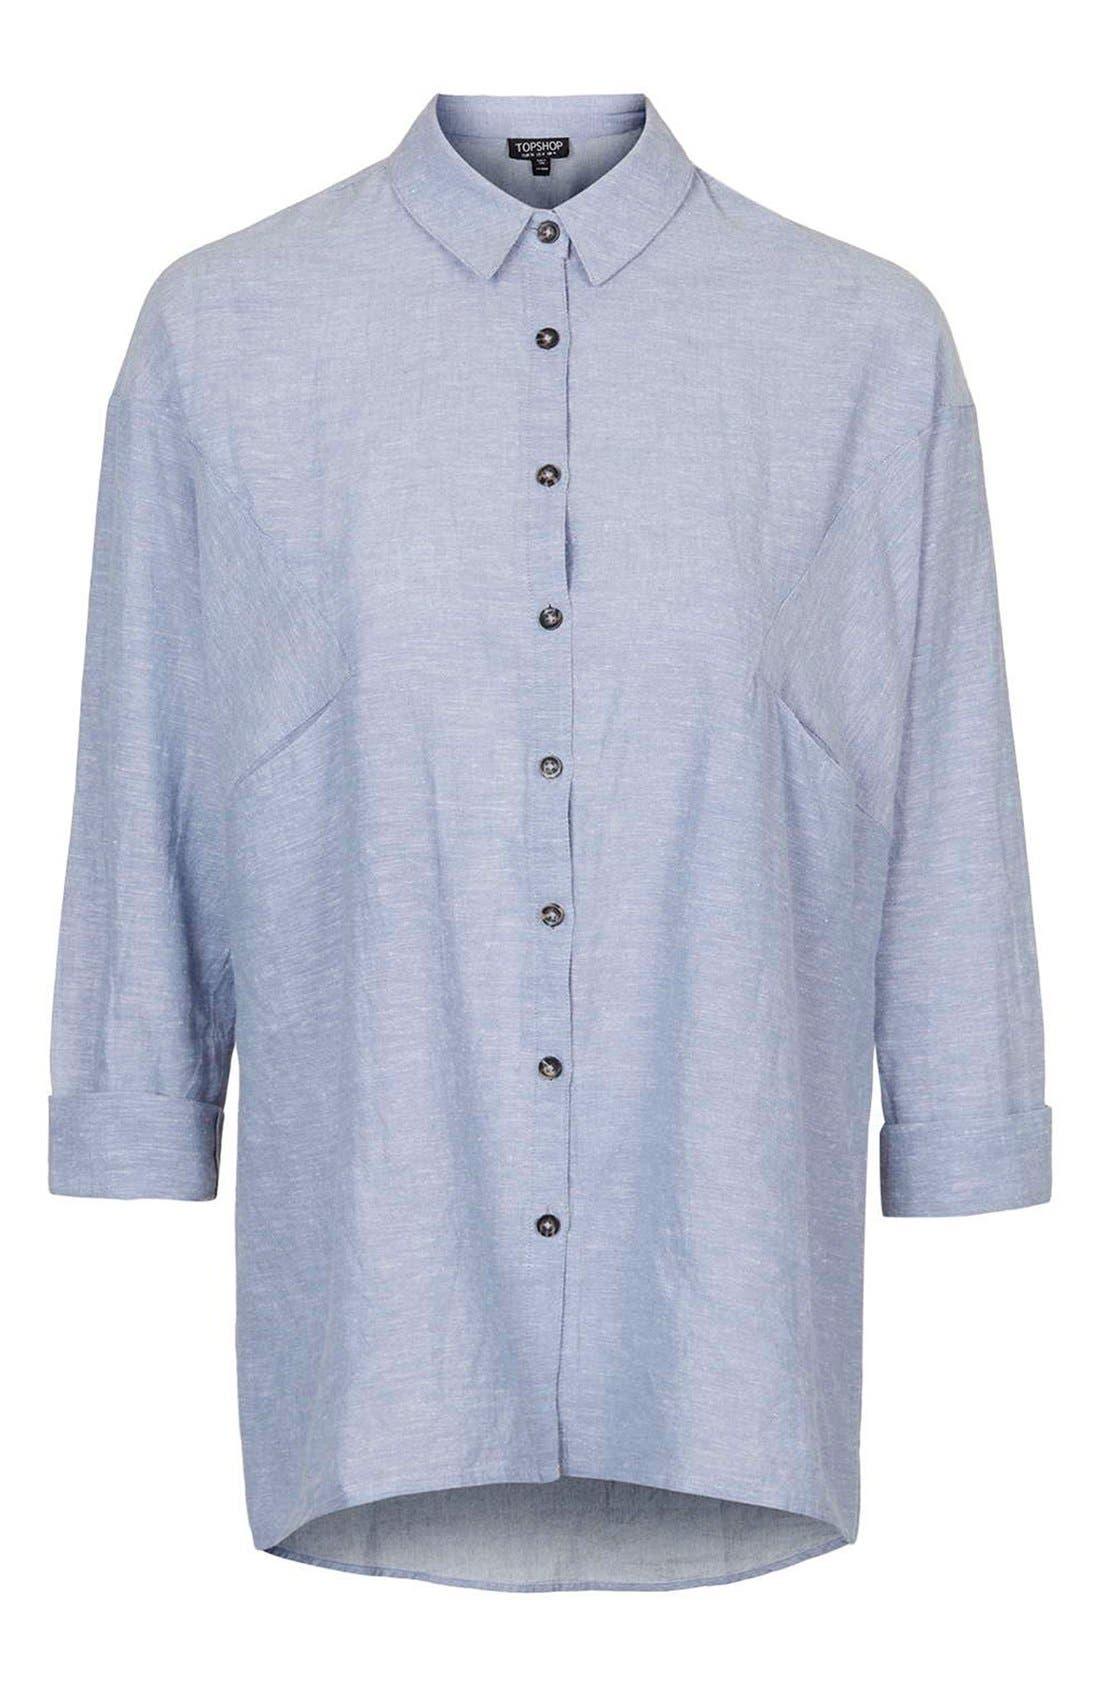 'Ivy' Oversize Chambray Shirt,                             Alternate thumbnail 4, color,